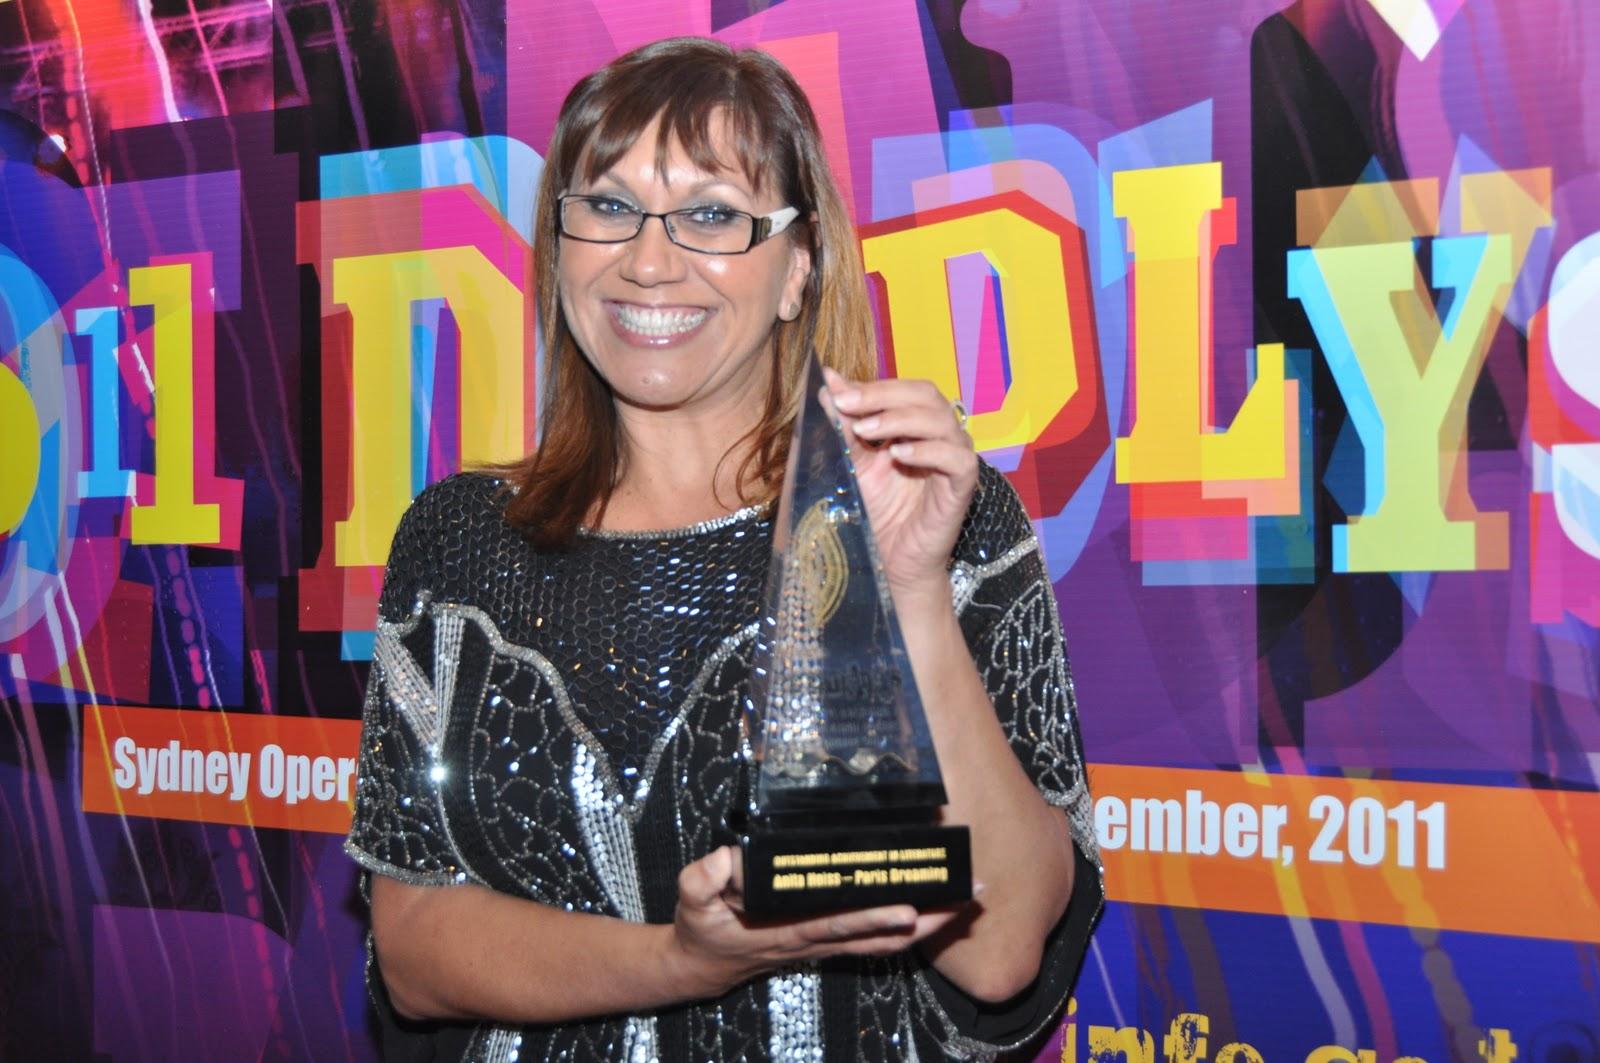 Anita Heiss Blog I M Grateful For The 2011 Deadly Awards border=